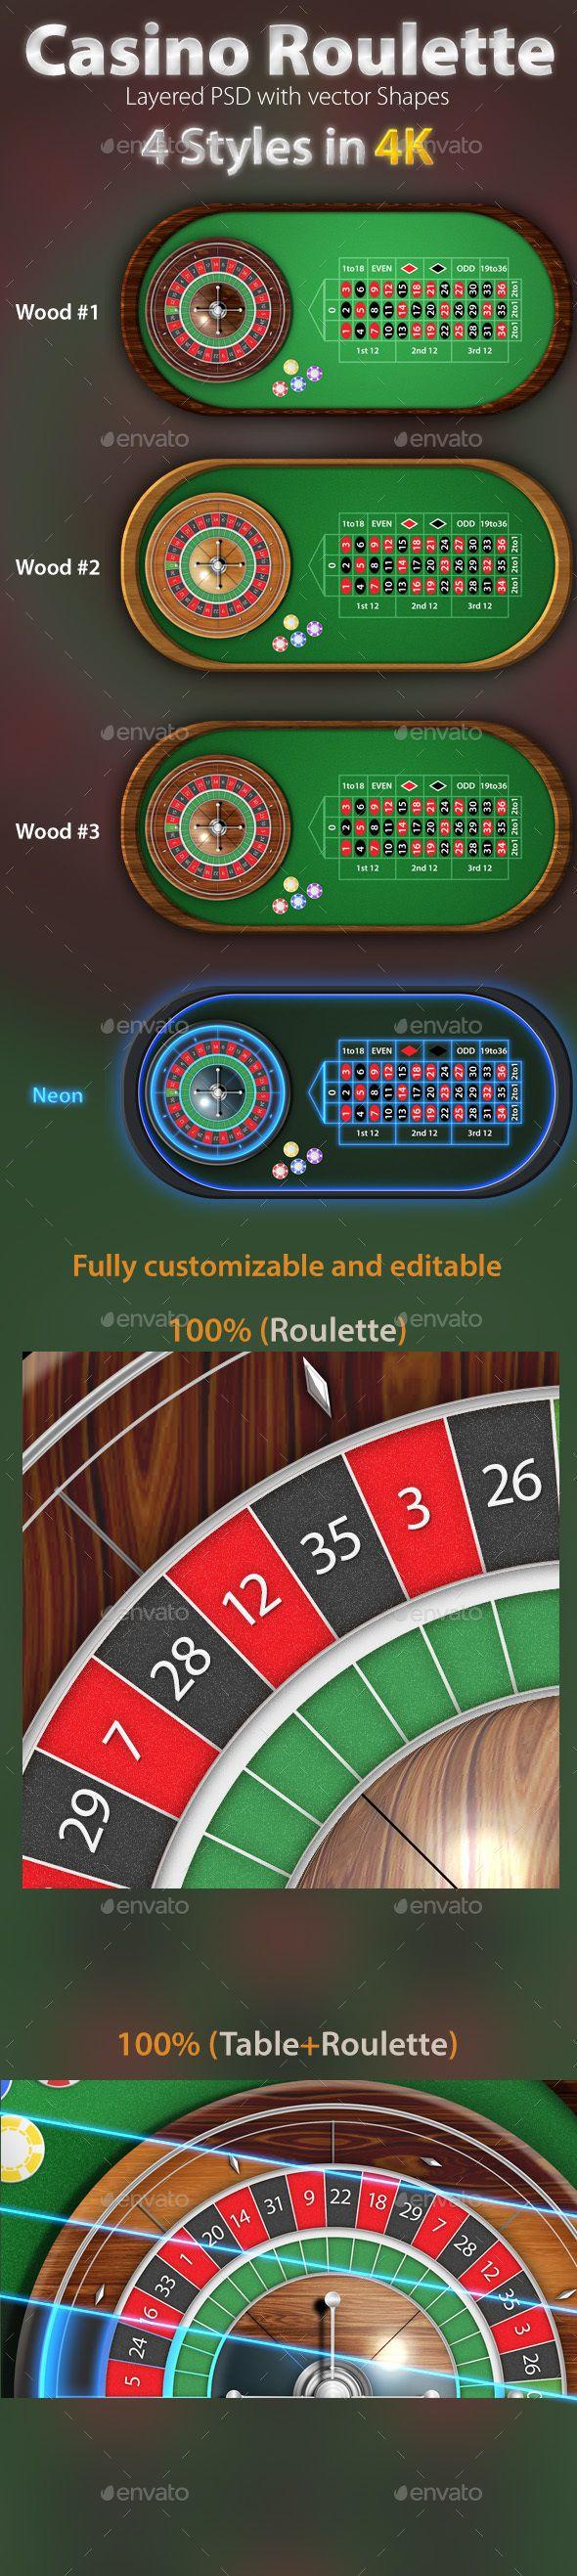 European Roulette Table Pack 4k Roulette Table Roulette Kit Games